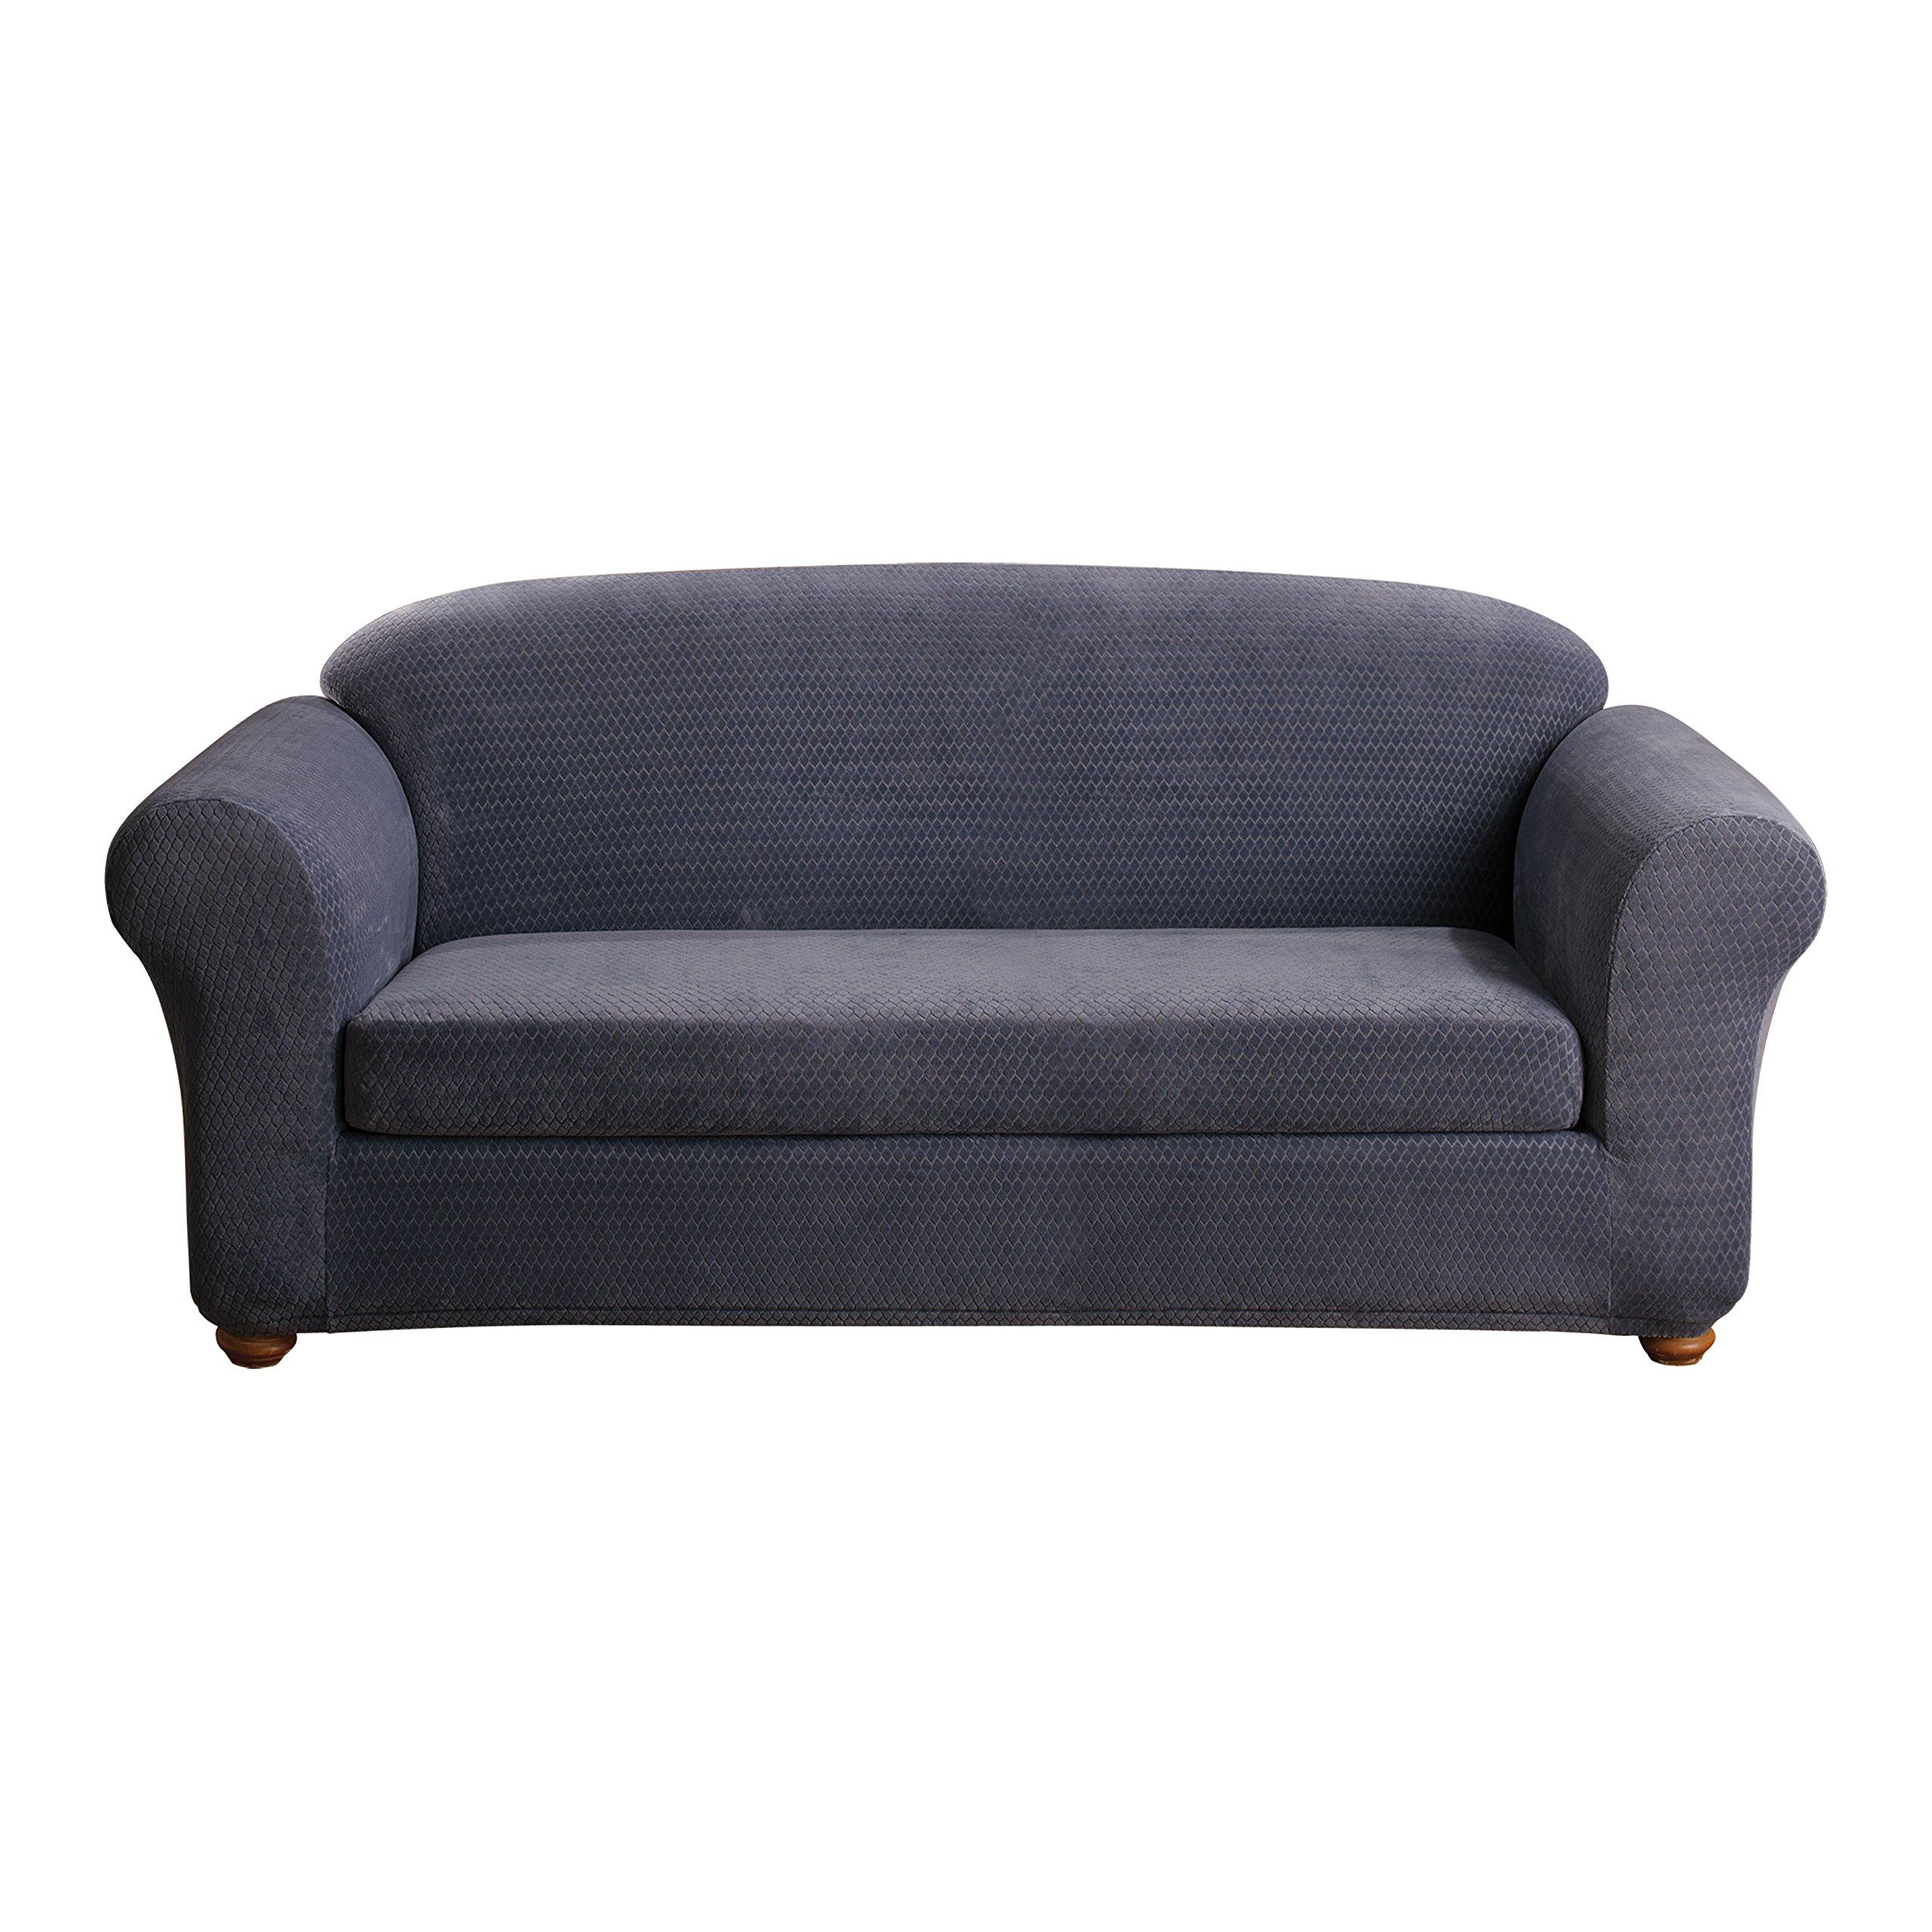 Sure Fit Stretch Royal Diamond 2-Piece - Sofa Slipcover  - Storm Blue (SF43408)